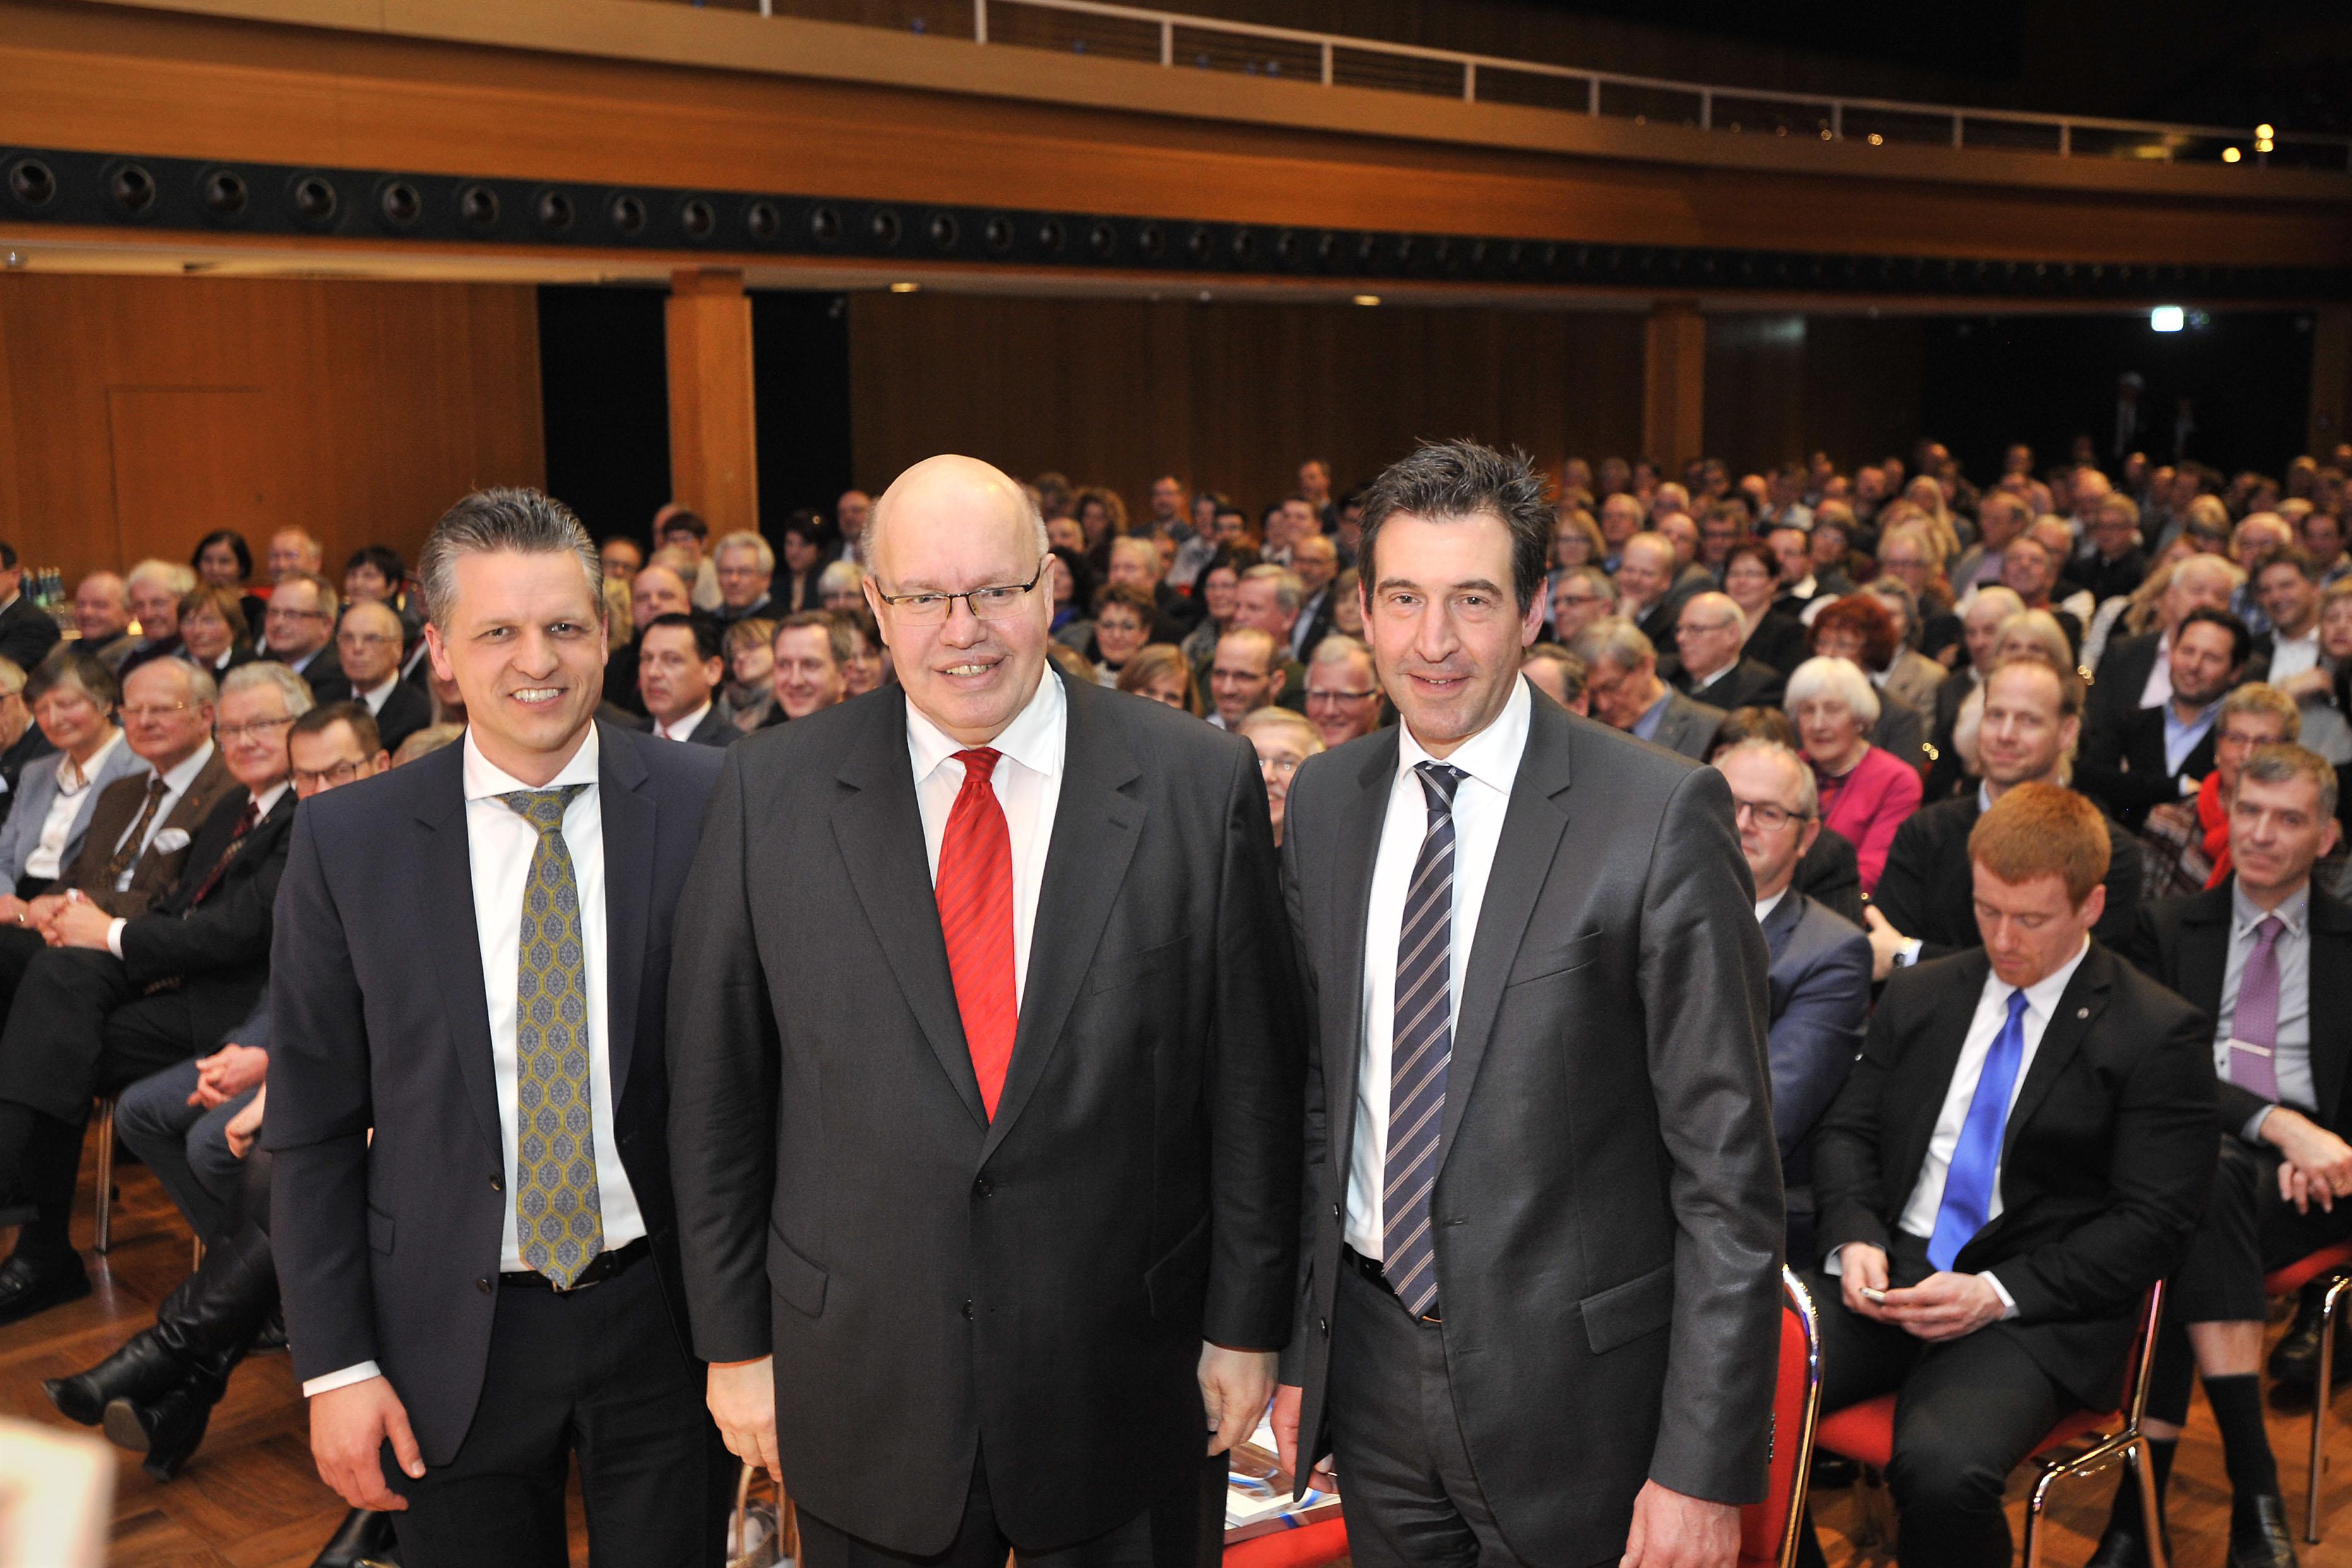 Frei, Altmaier, OB Pauly